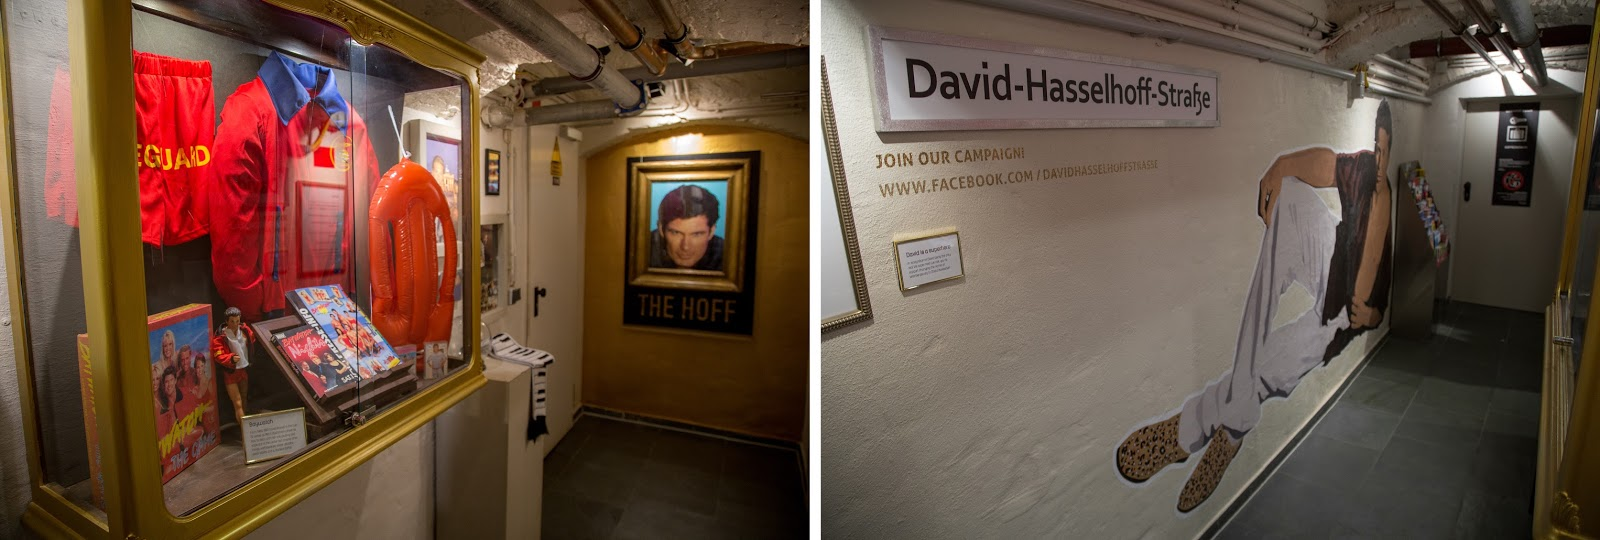 david hasselhoff museum in berlin